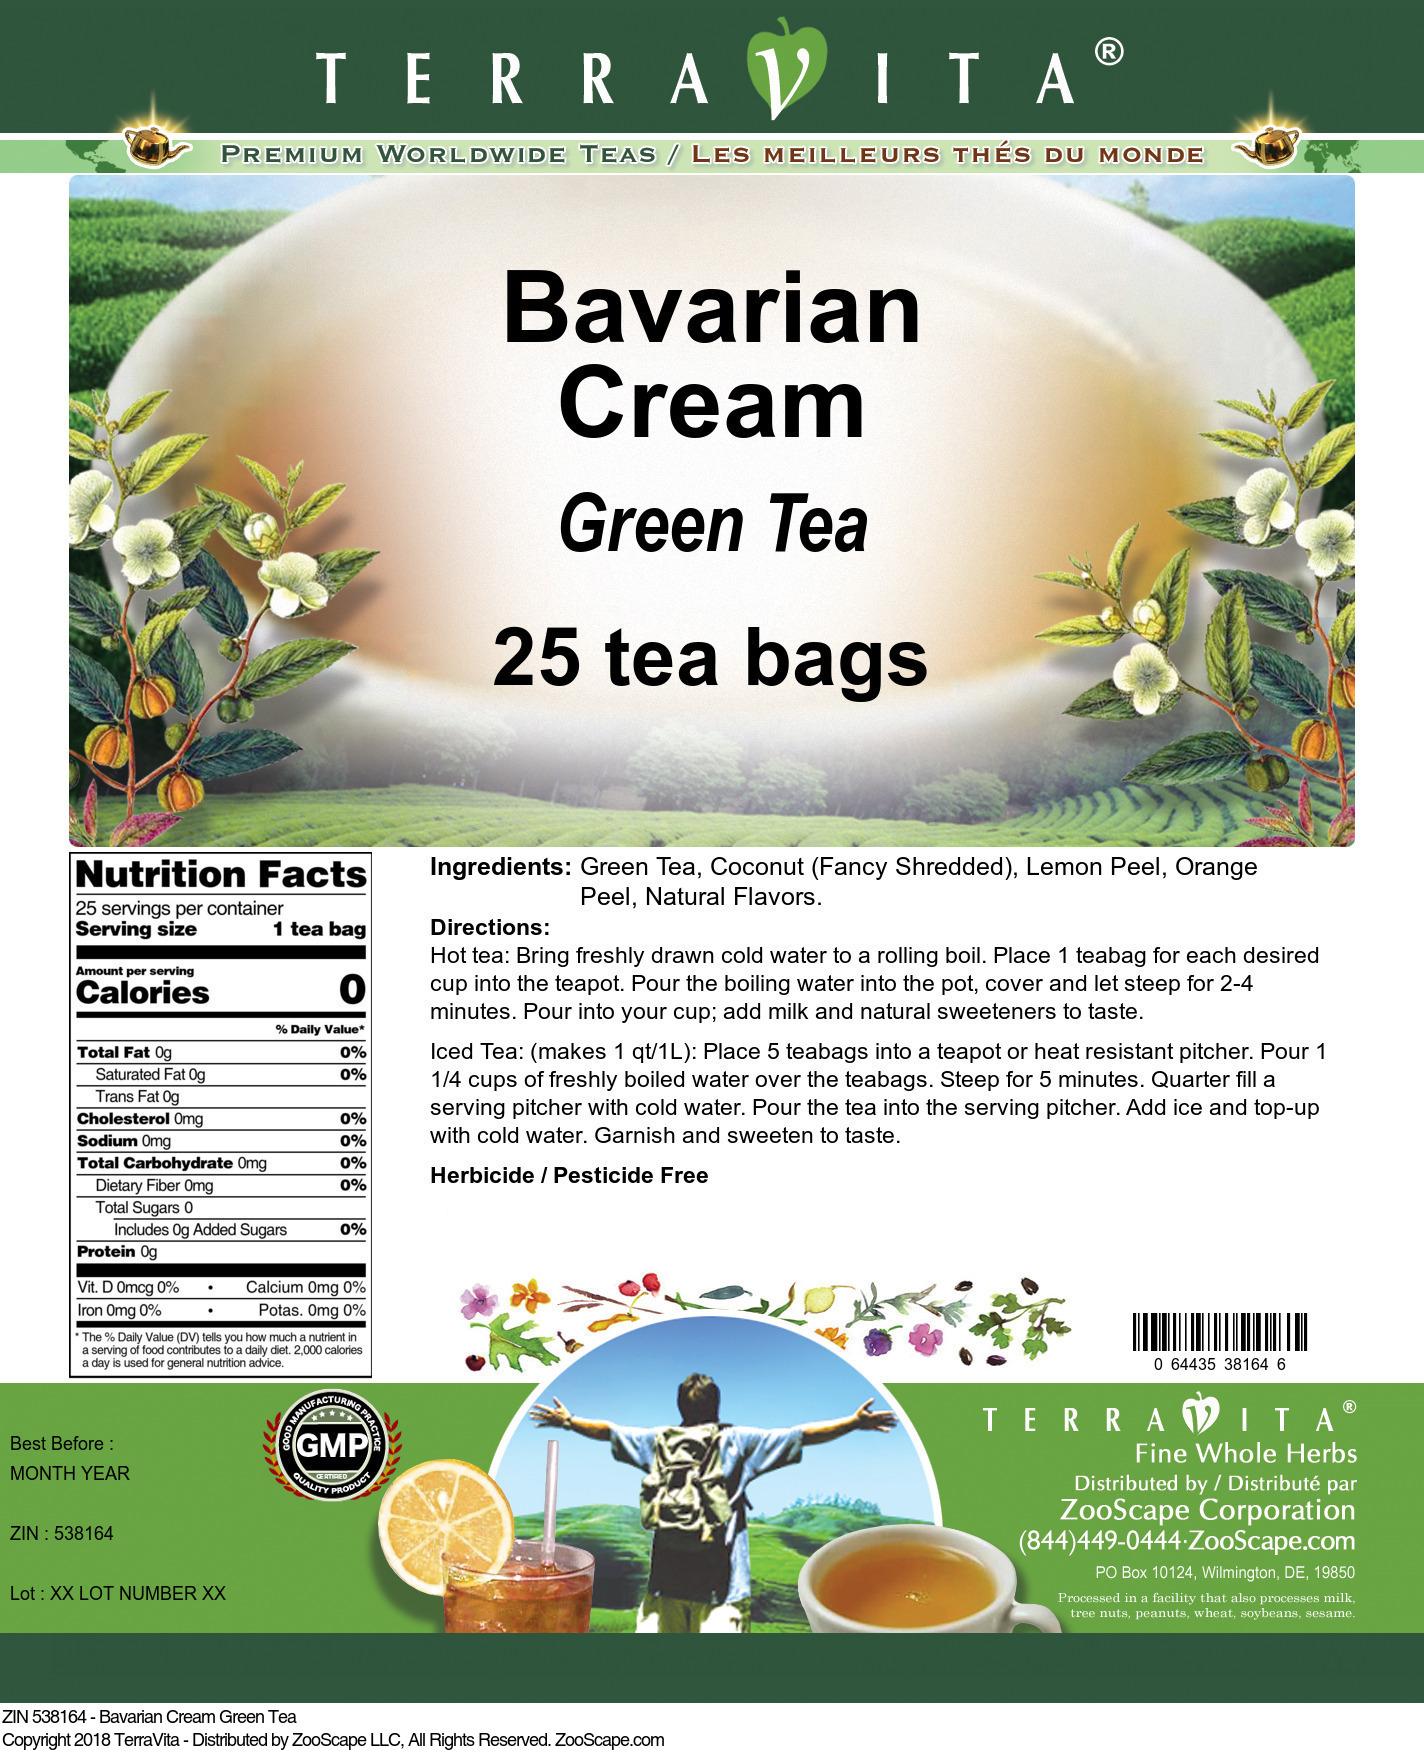 Bavarian Cream Green Tea